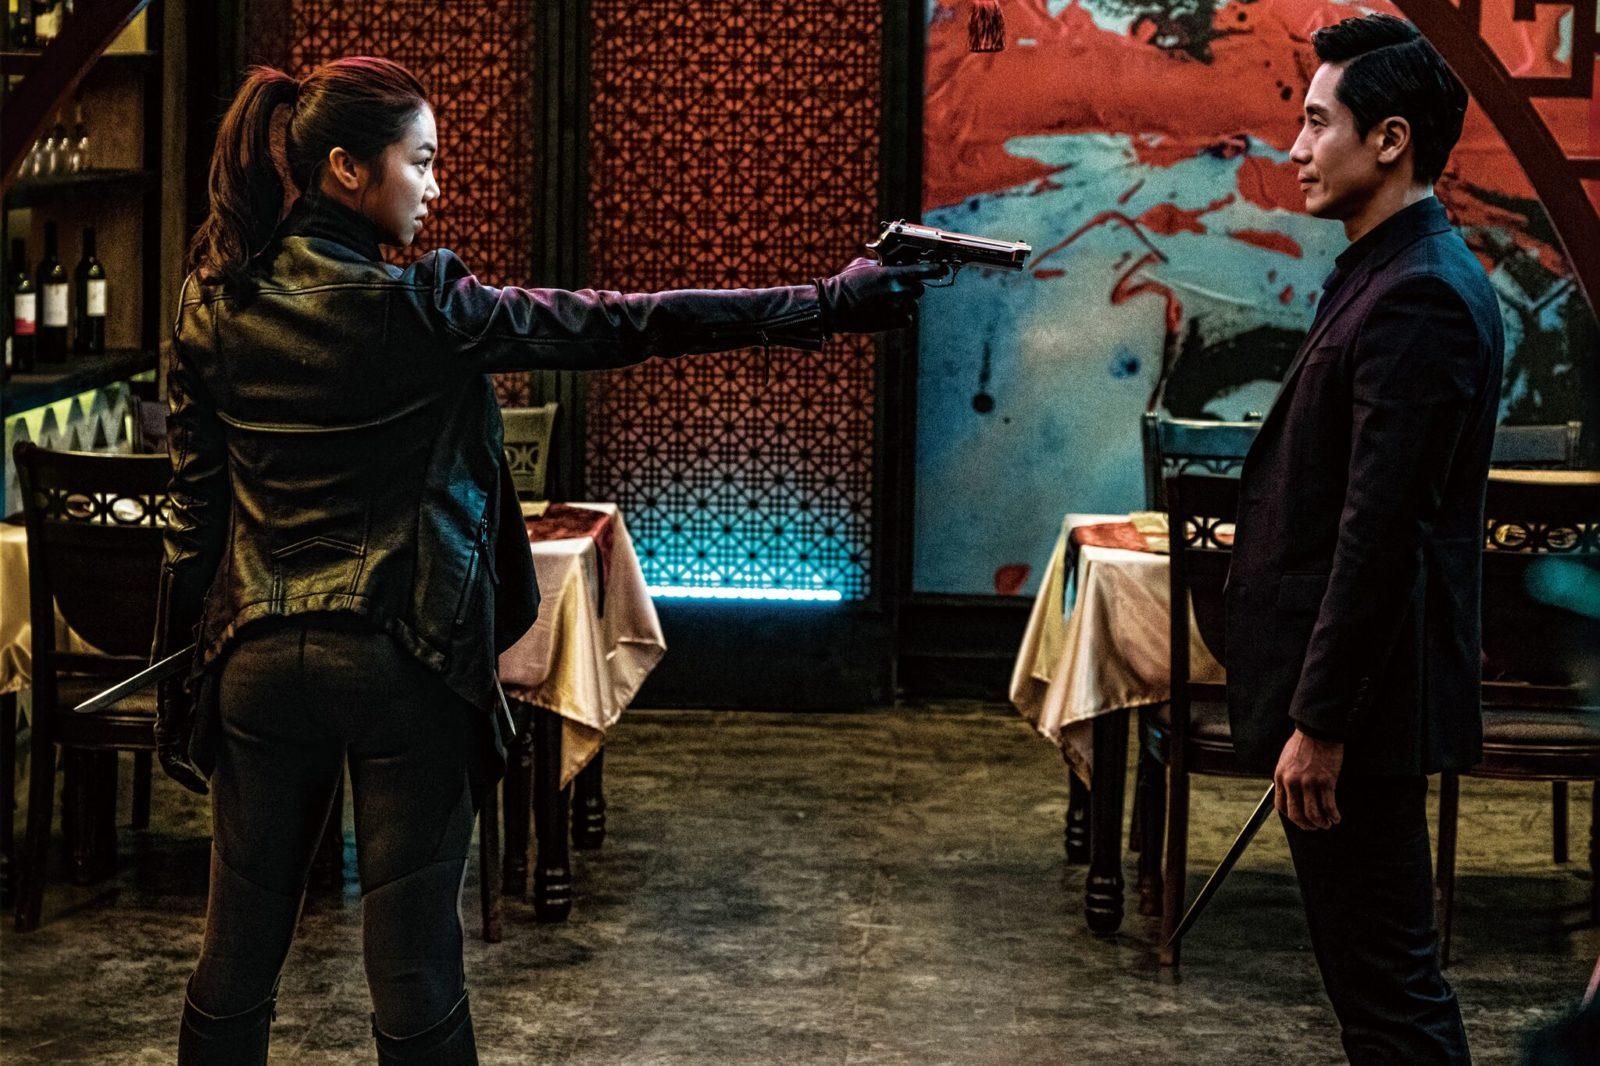 Fantasia Film Festival Review: THE VILLAINESS